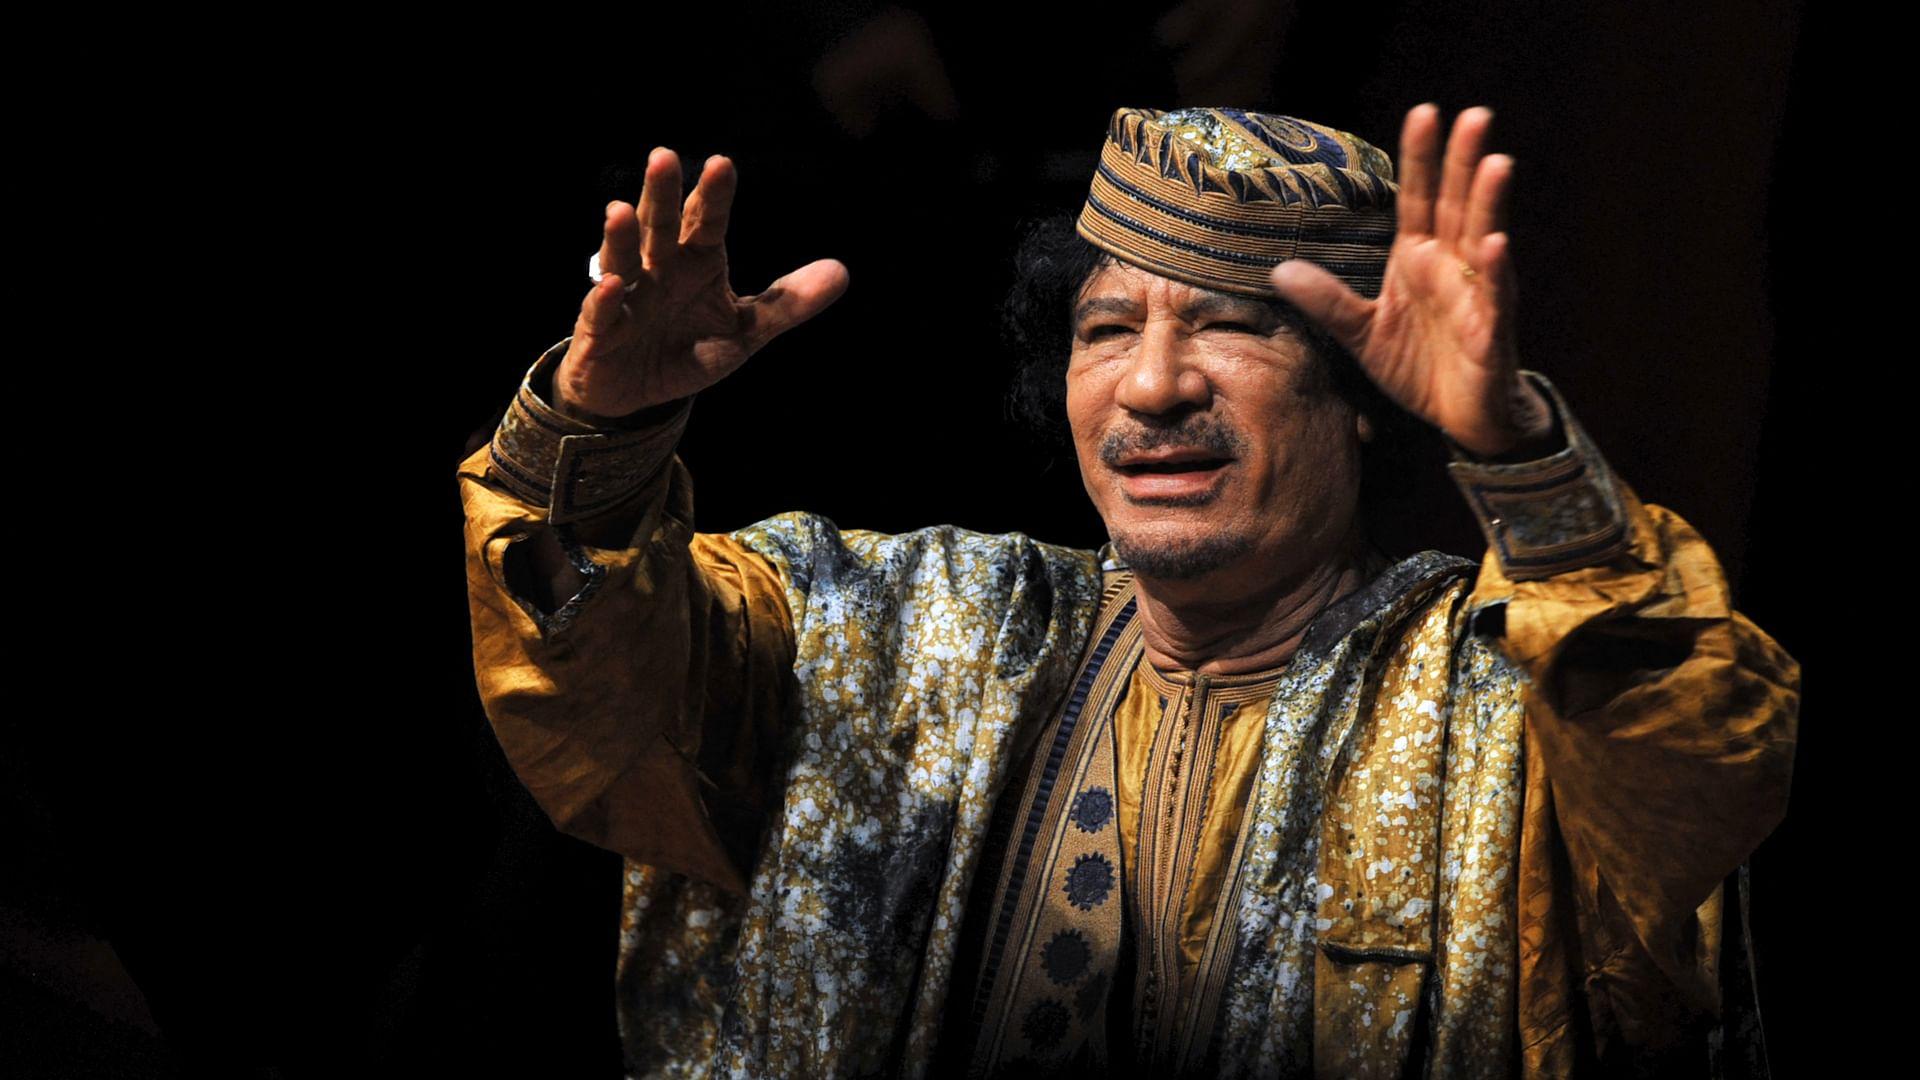 Libyen: Das Chaos nach Gaddafi